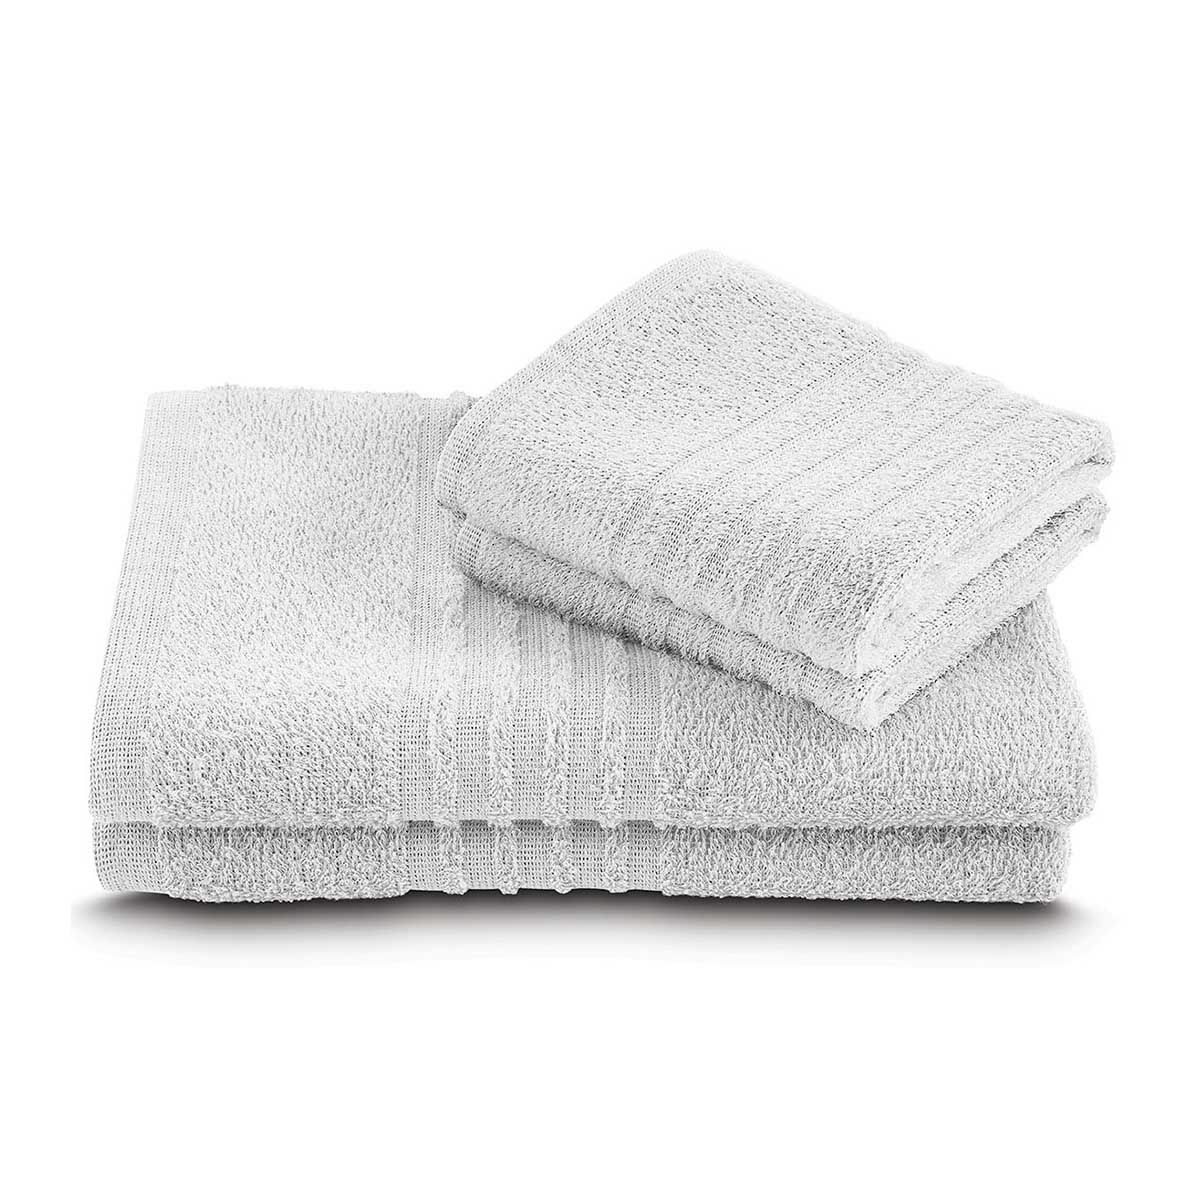 Toalha Branca Felpuda de Banho Unique 61237 Lepper